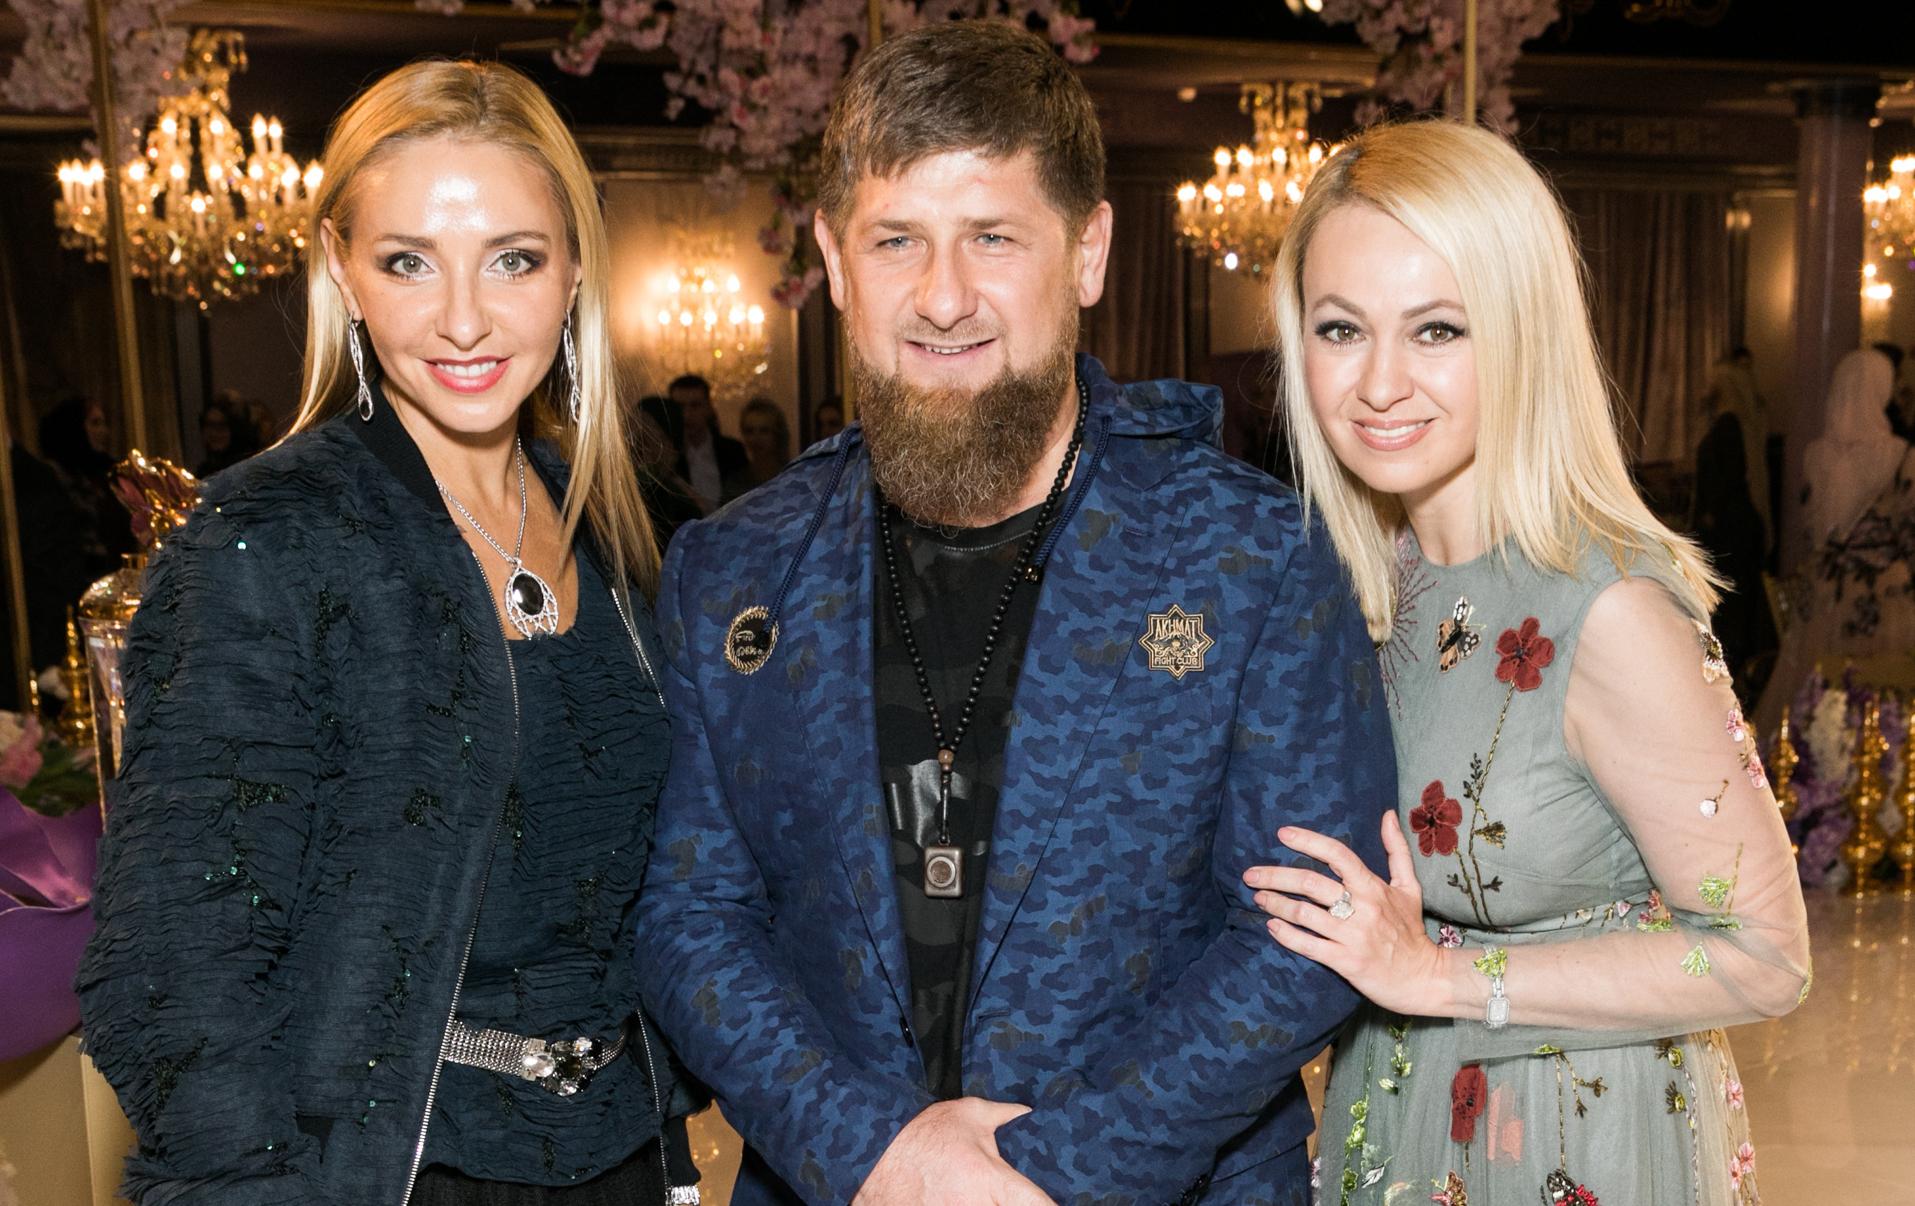 Tatyana Navka and Dmitry Peskov declassified their novel on 01.12.2014 86